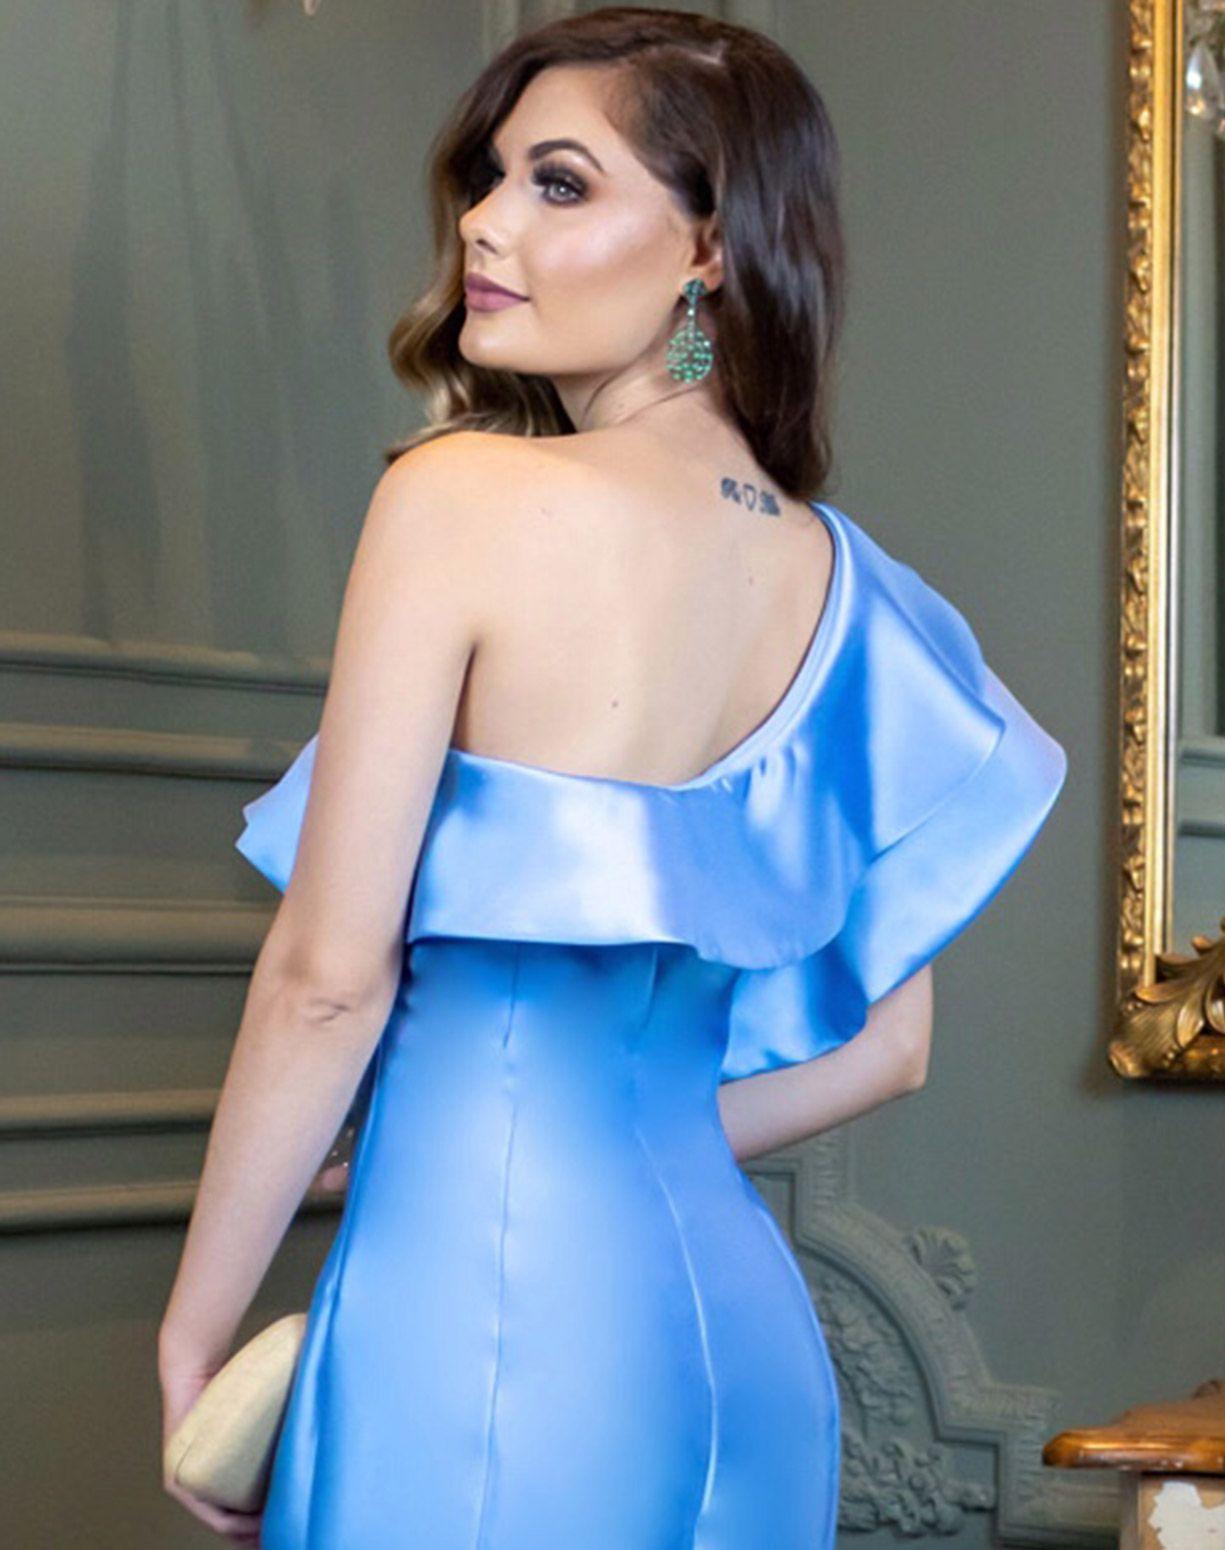 Vestido Azul Serenity de Um Ombro Só em Zibeline